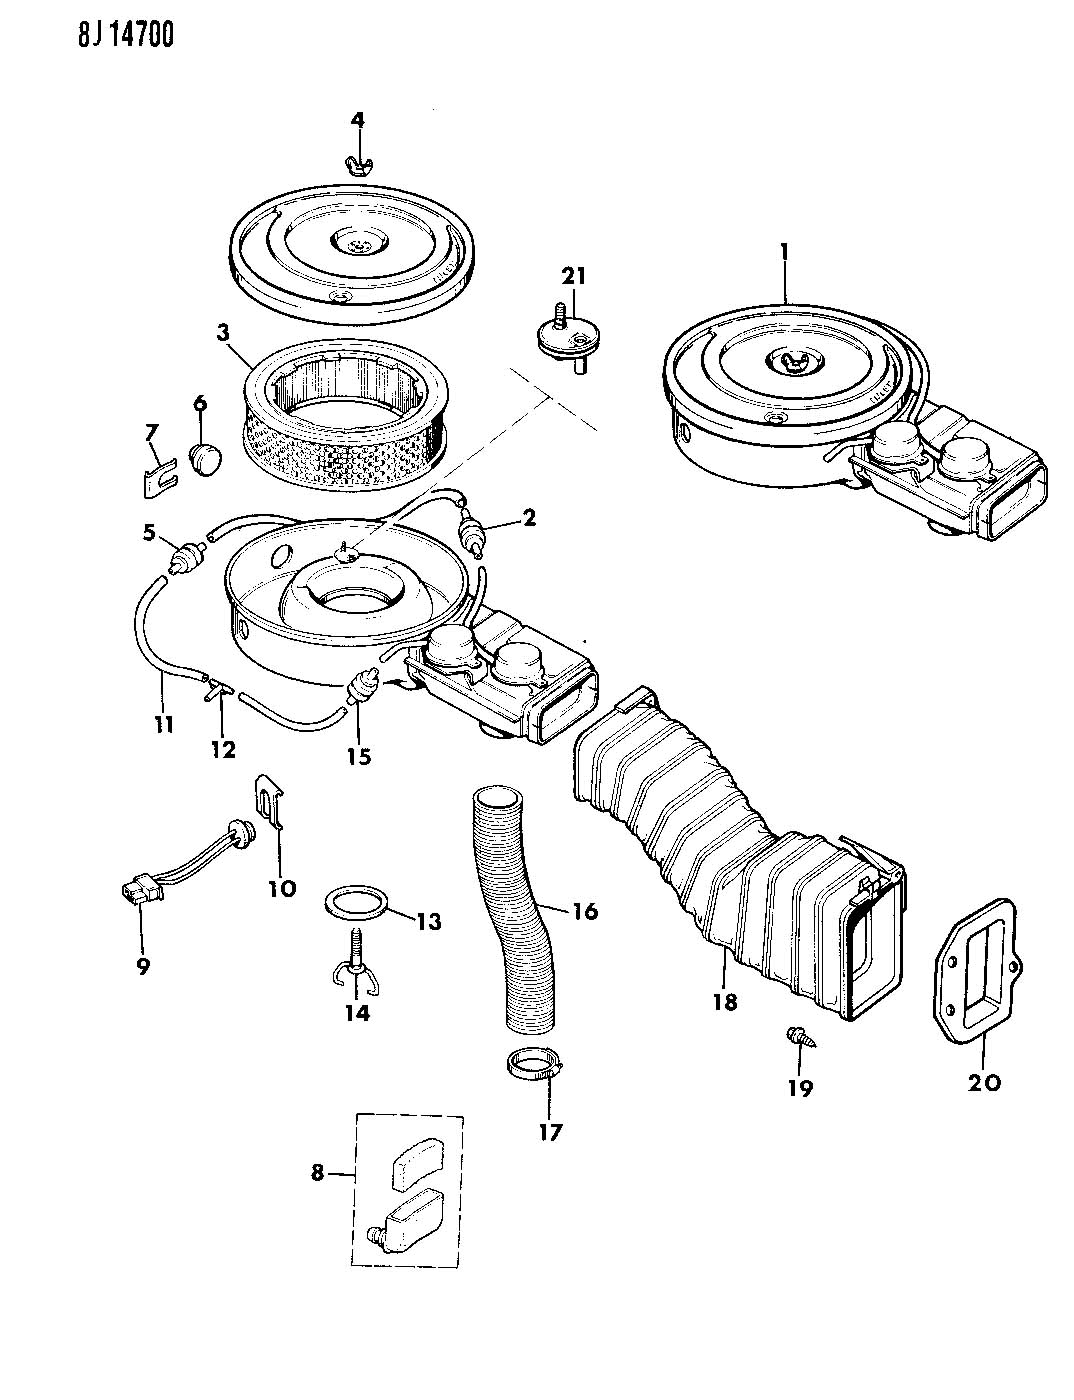 1989 Jeep Switch, thermal vacuum, switch, vacuum. Us